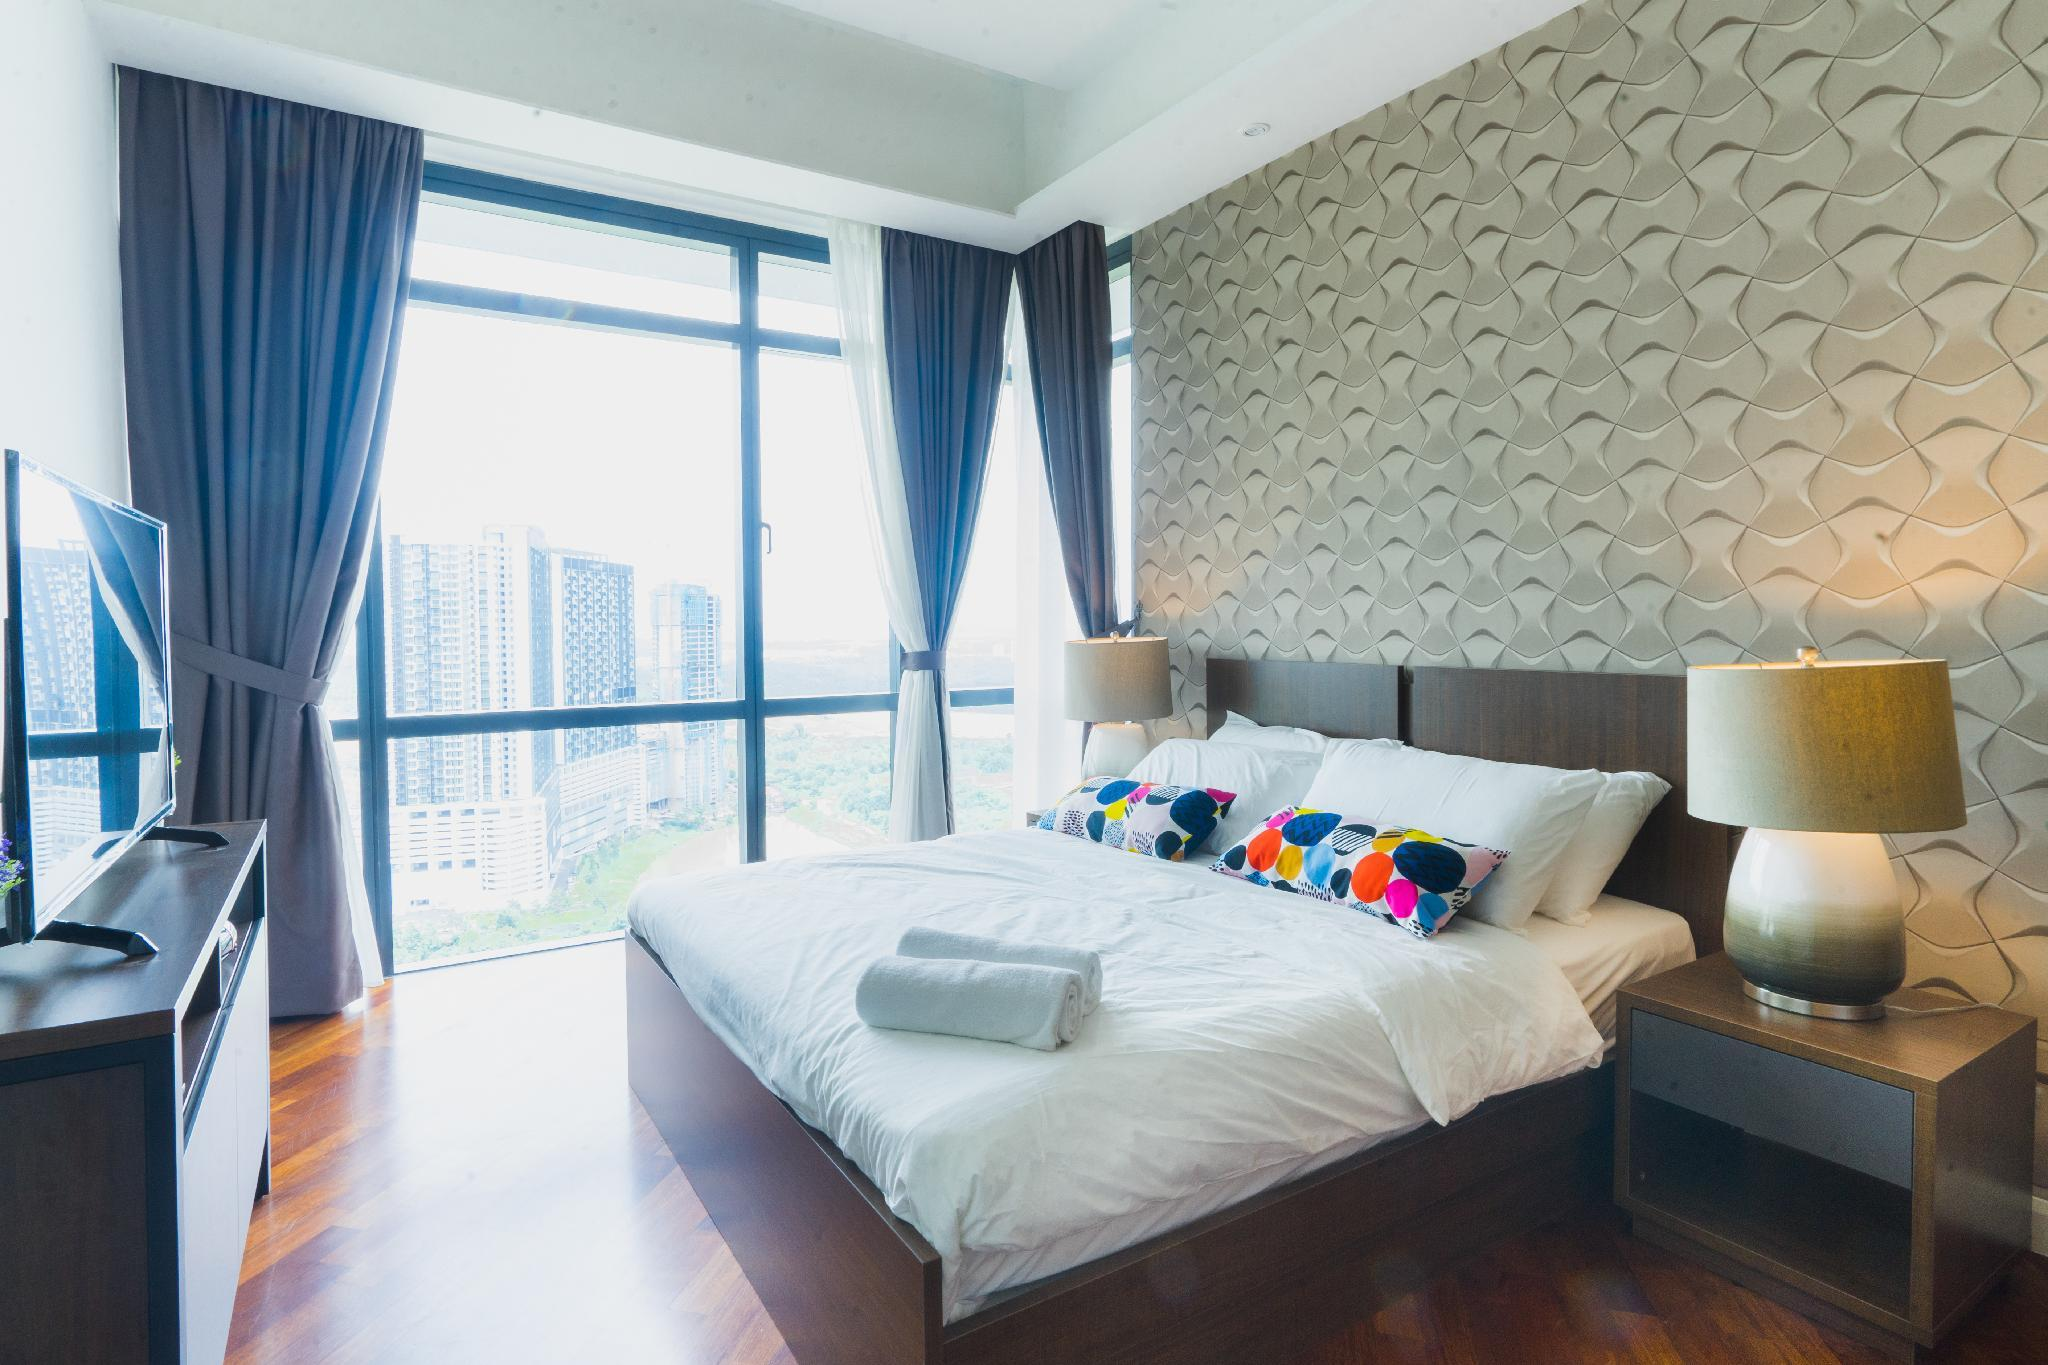 Grand Medini  6Pax  WIFI  C18 @ JB City Home